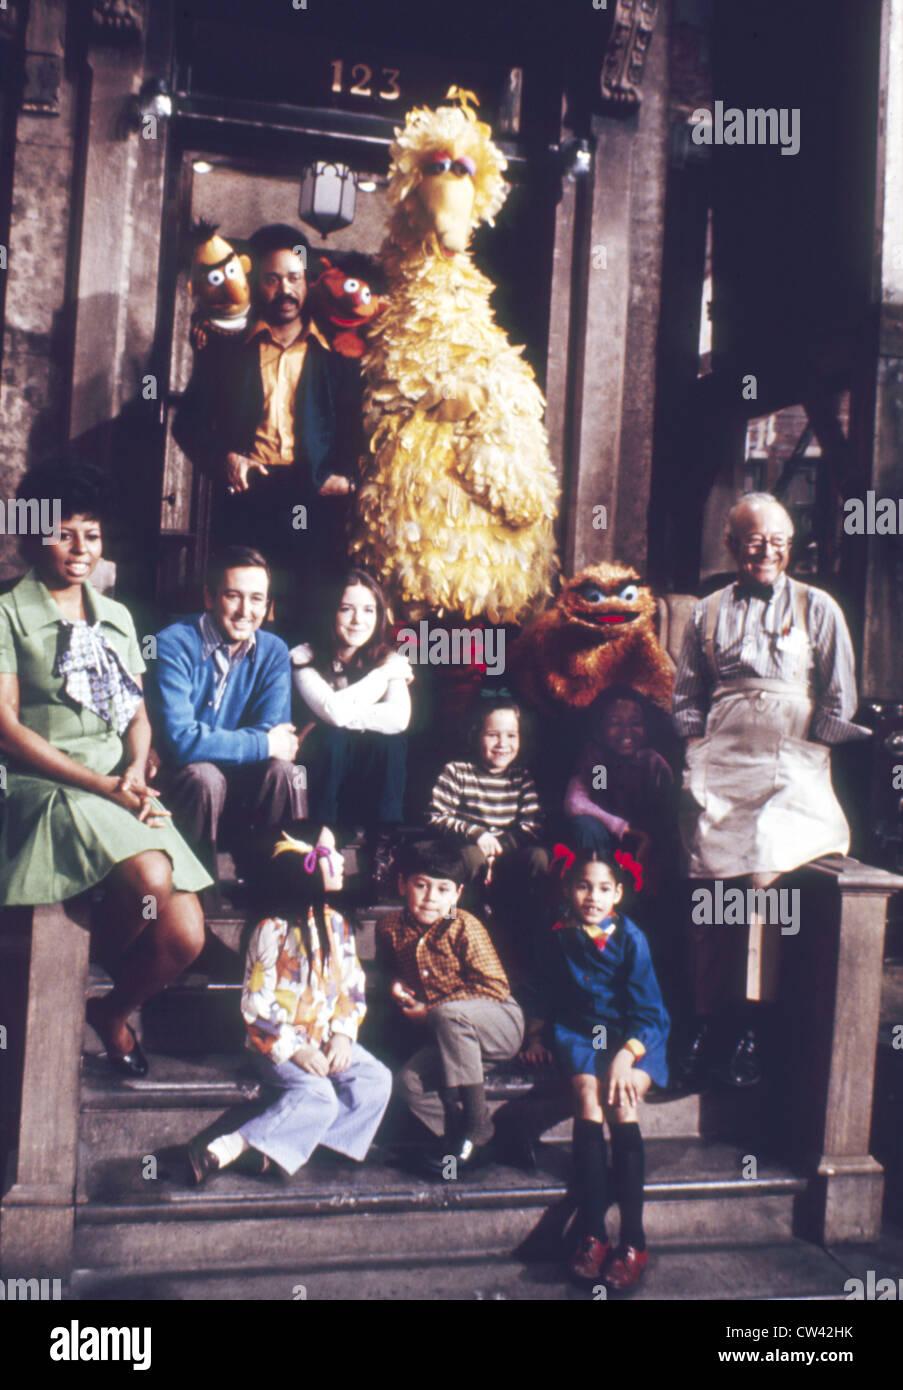 Sesame Street (TV Series) - Stock Image